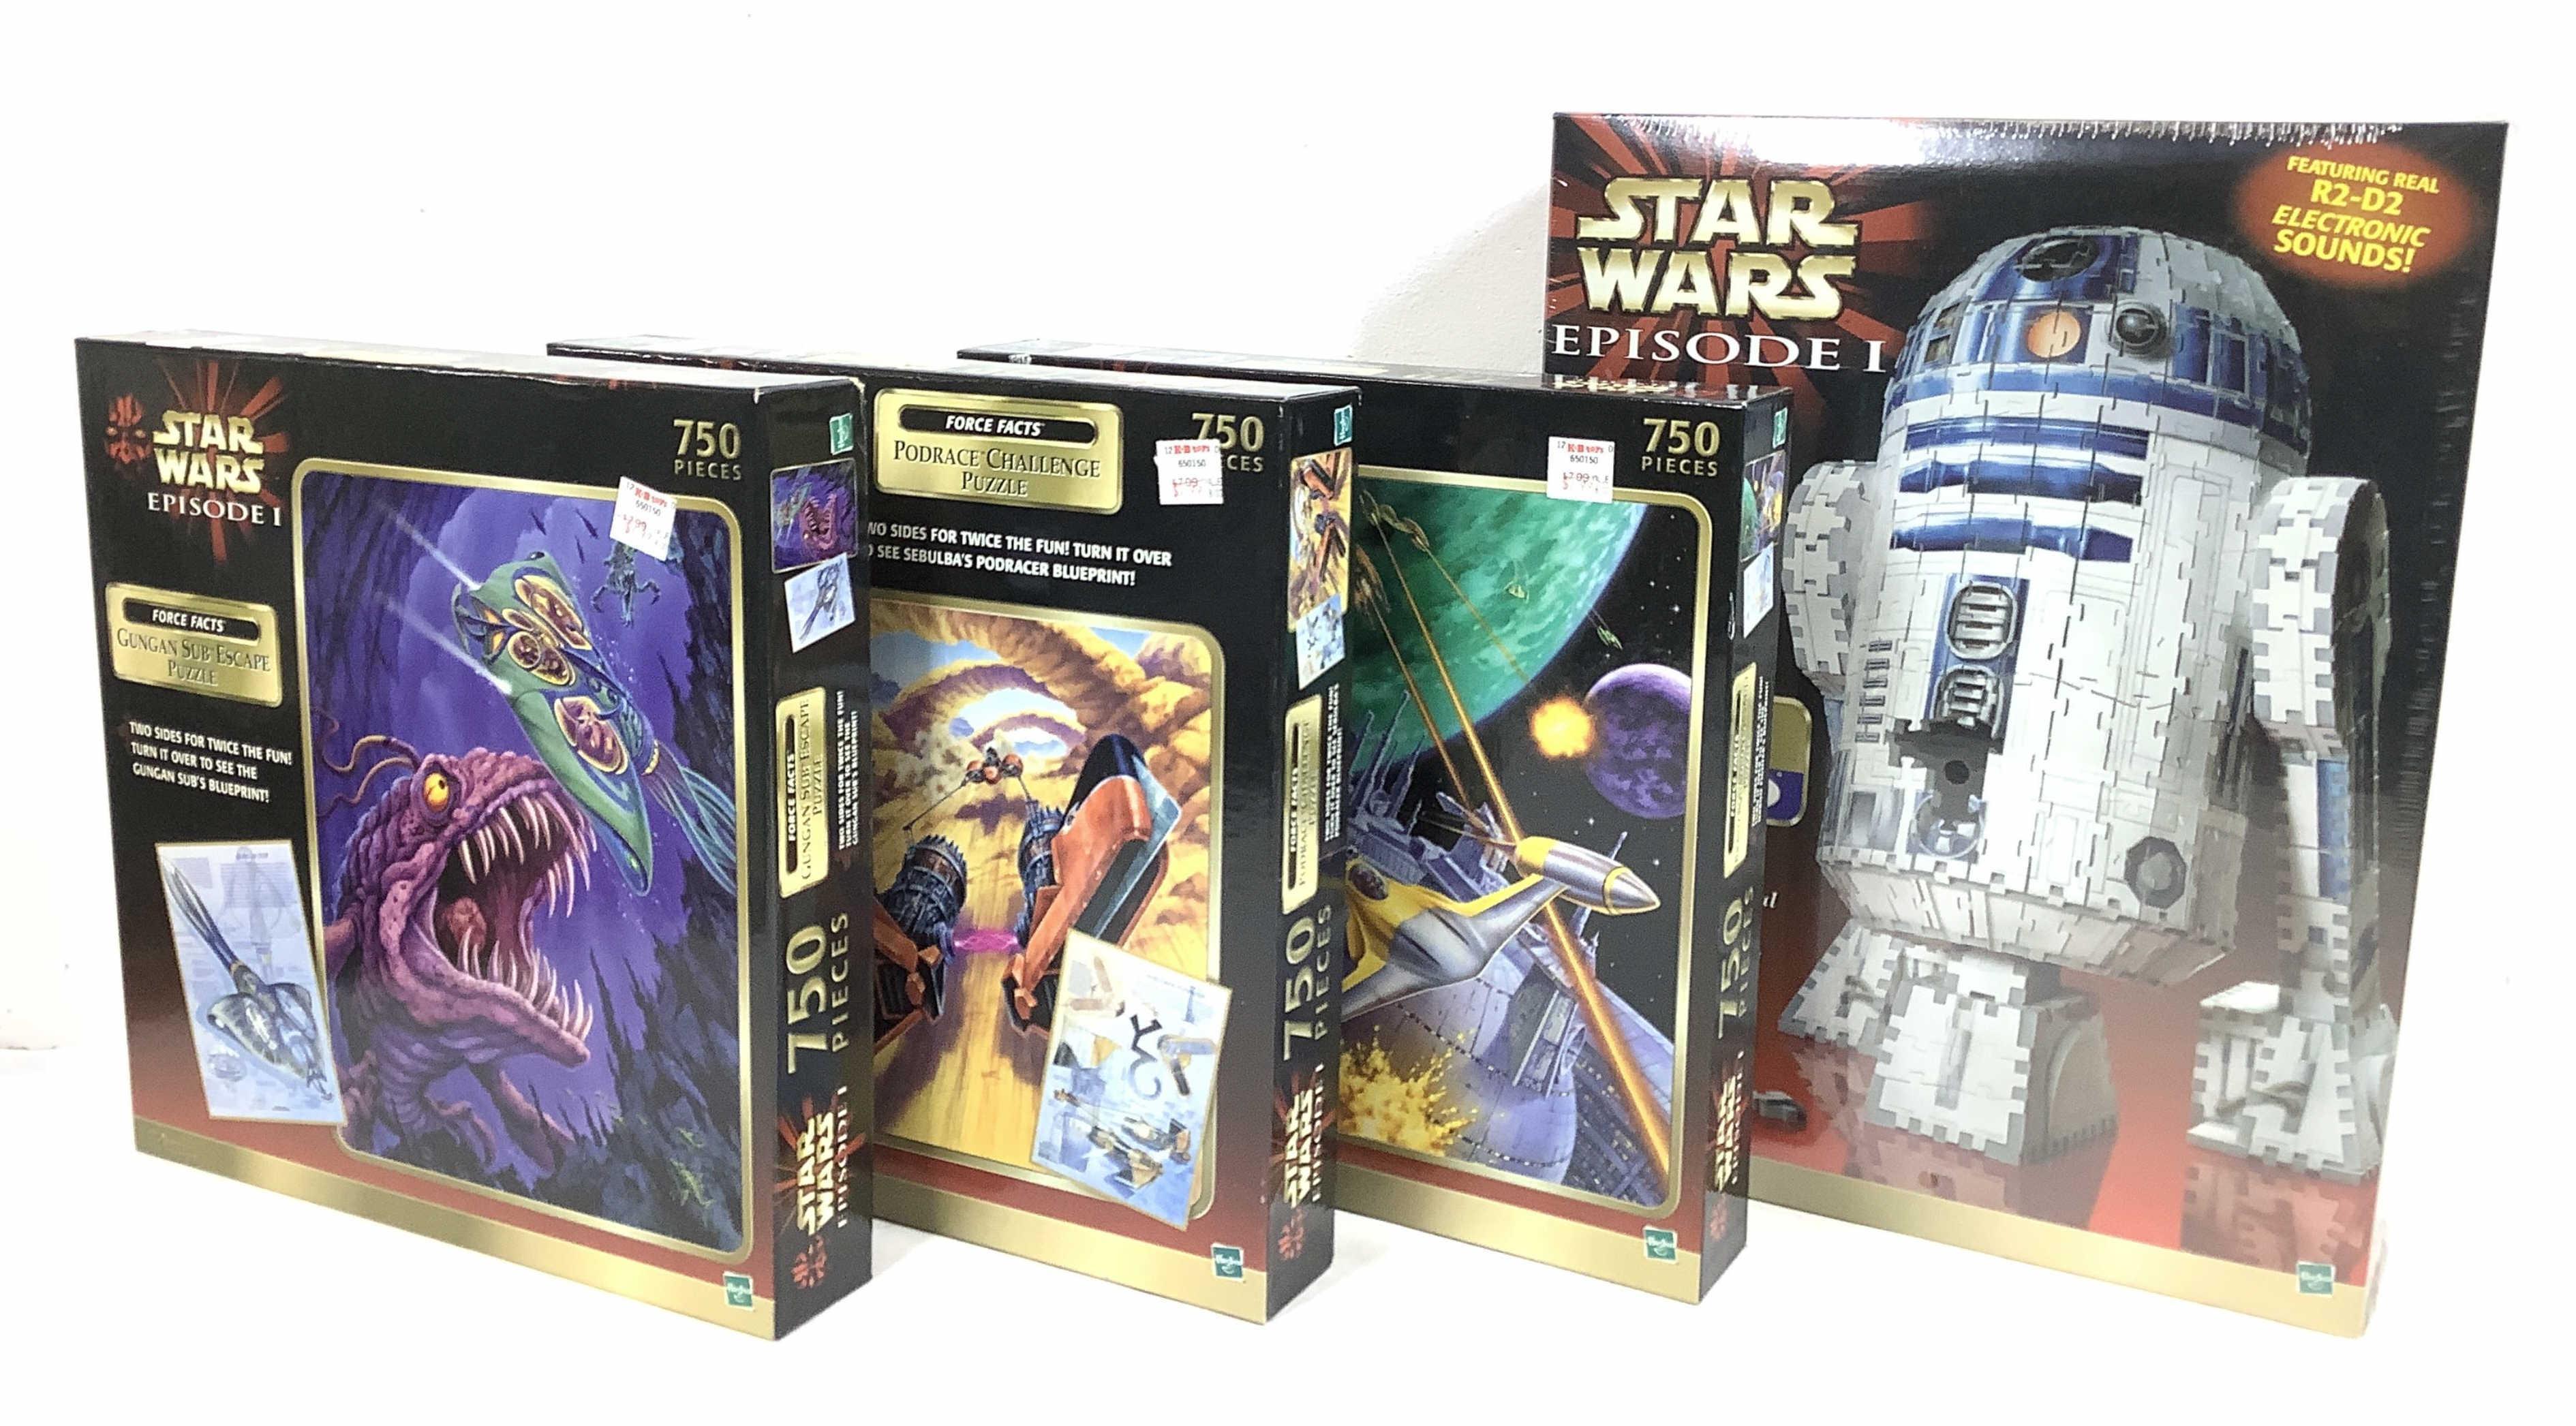 Lot - (4c) Hasbro Star Wars Episode 1 Puzzles